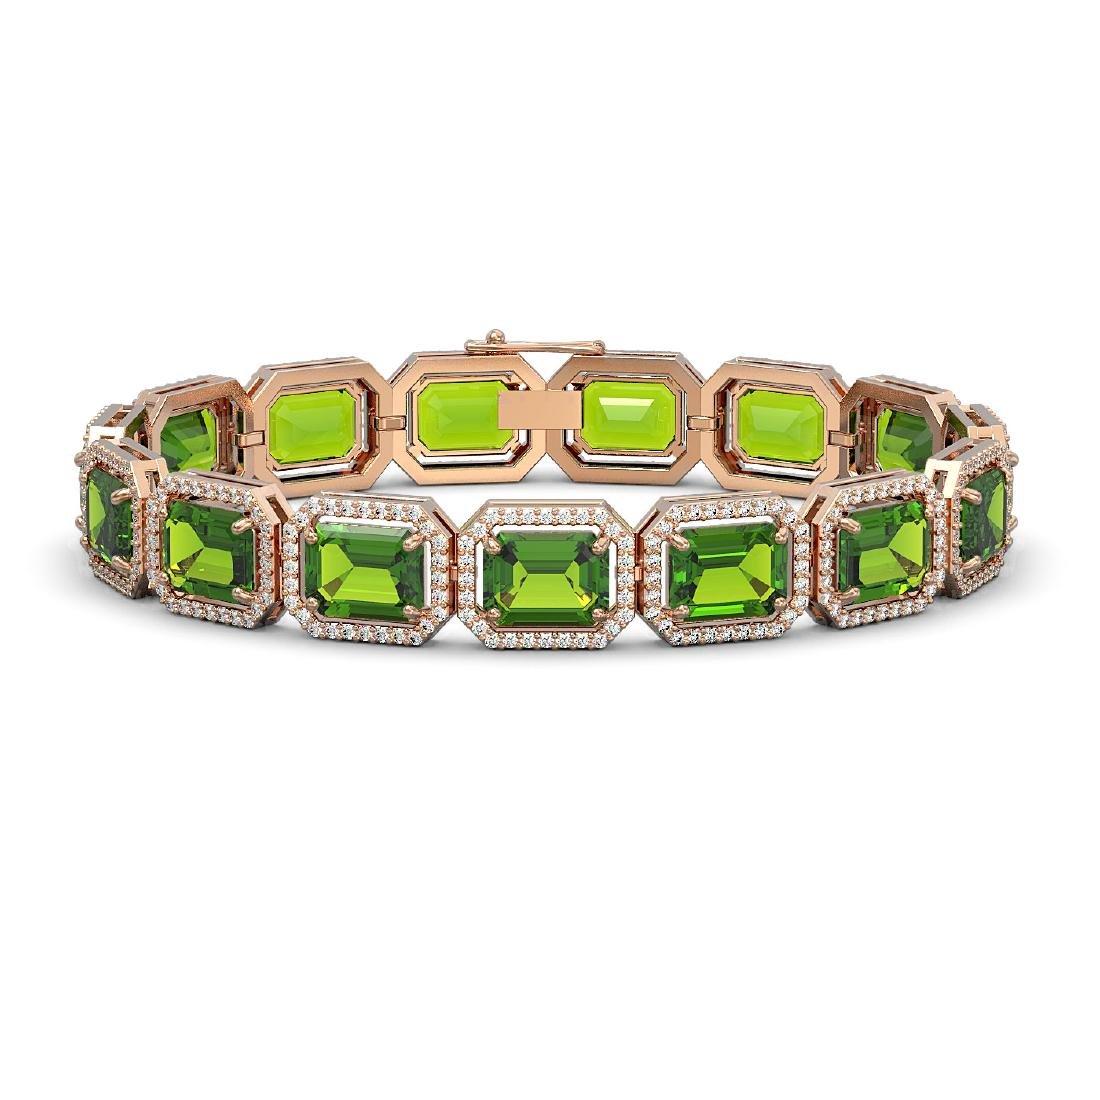 33.37 CTW Peridot & Diamond Halo Bracelet 10K Rose Gold